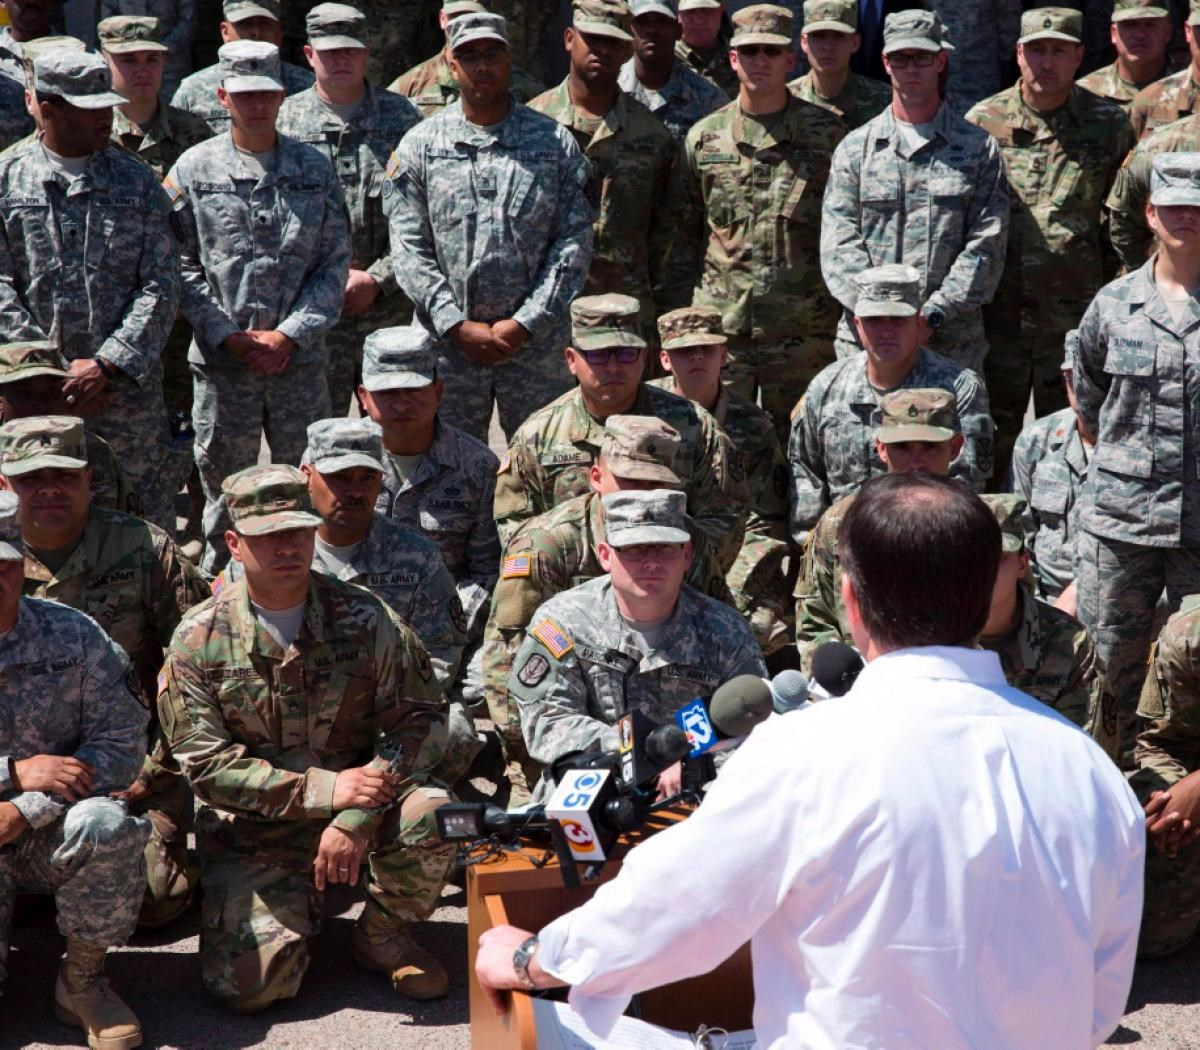 nat 36 thousand u s troops - HD1200×1050